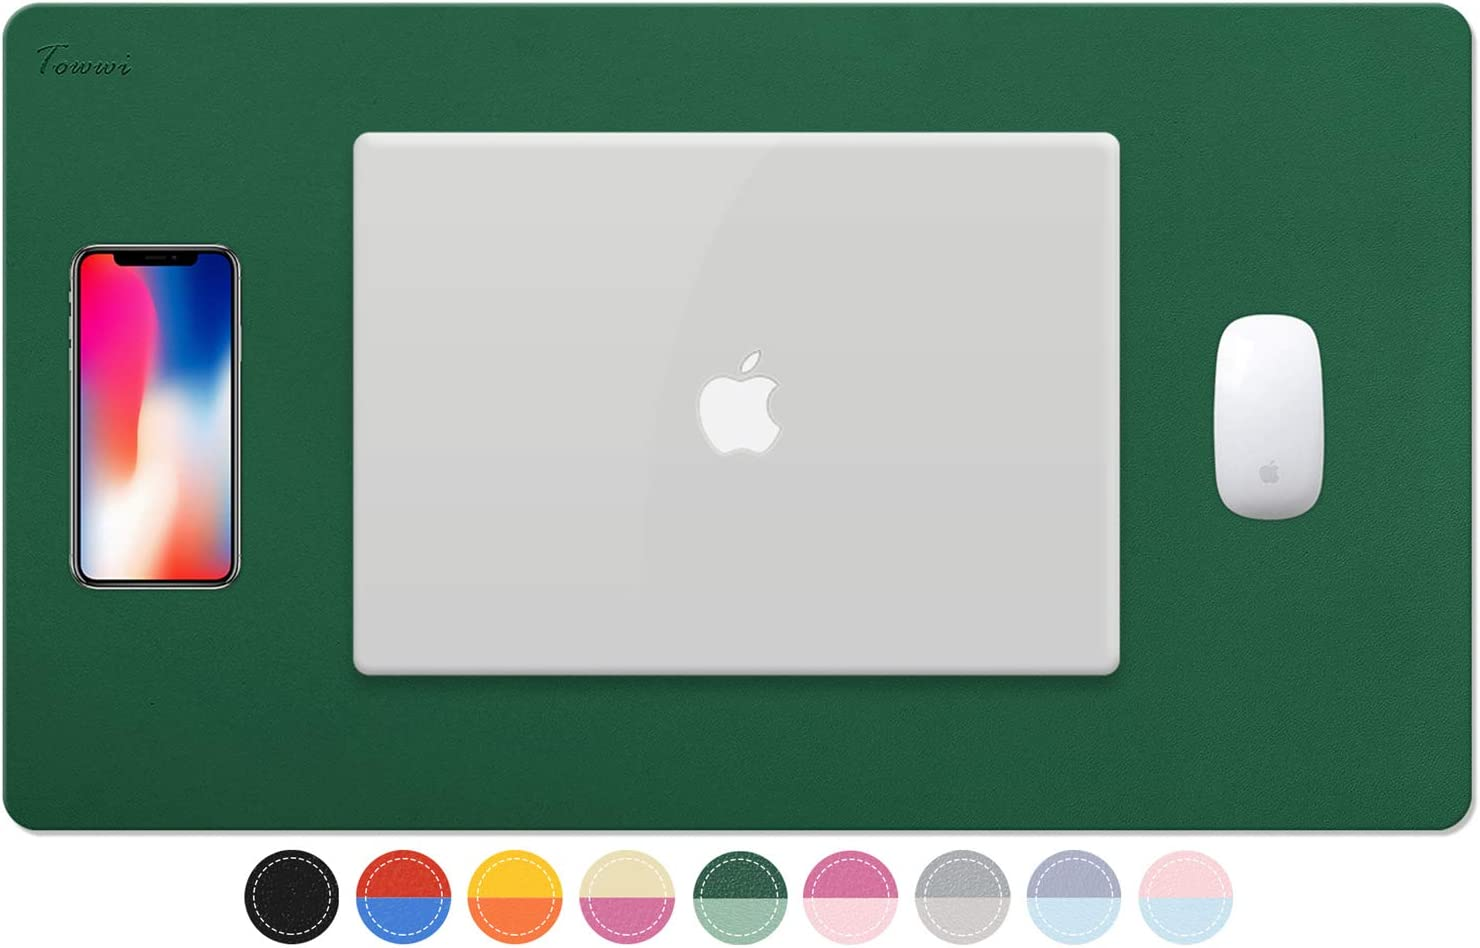 "TOWWI Dual Sided Desk Pad, 24"" x 14"" PU Leather Desk Mat, Waterproof Desk Blotter Protector Mouse Pad (Dark Green/Light Green)"